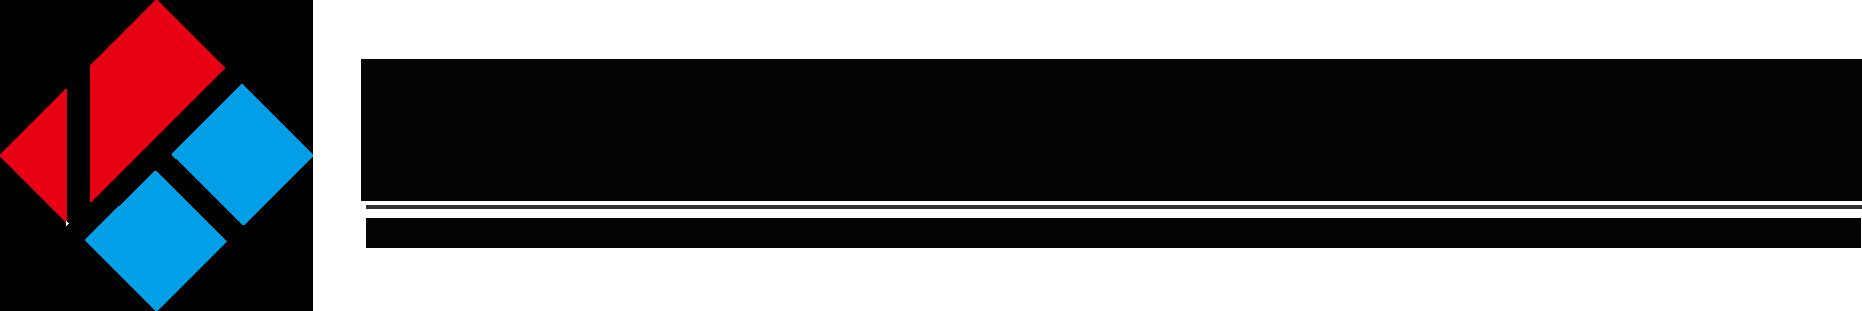 kpia_kor_logo